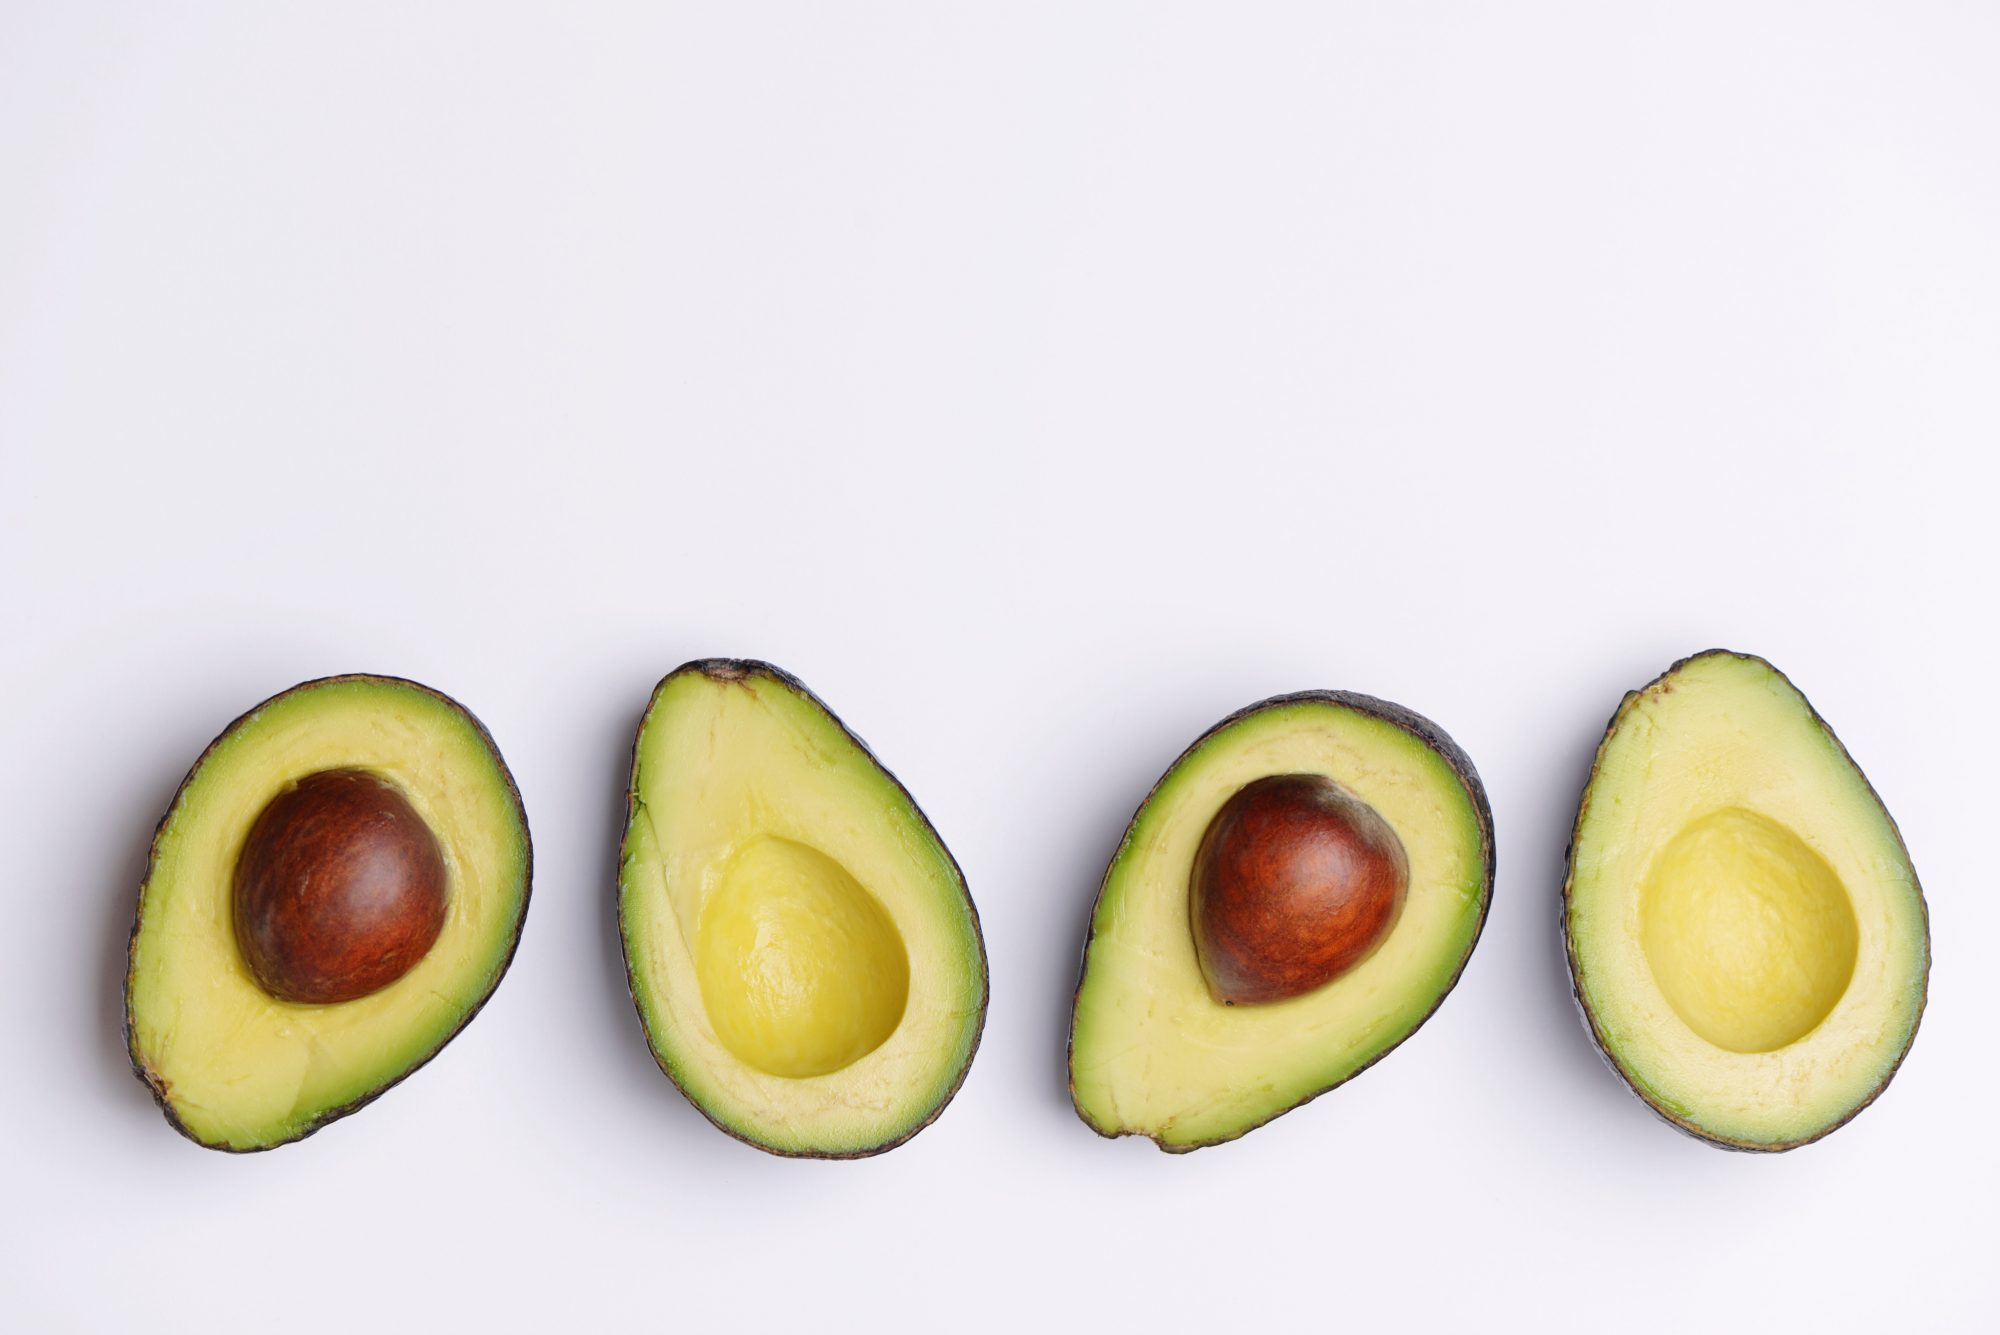 Avocado halves Getty 7/31/20